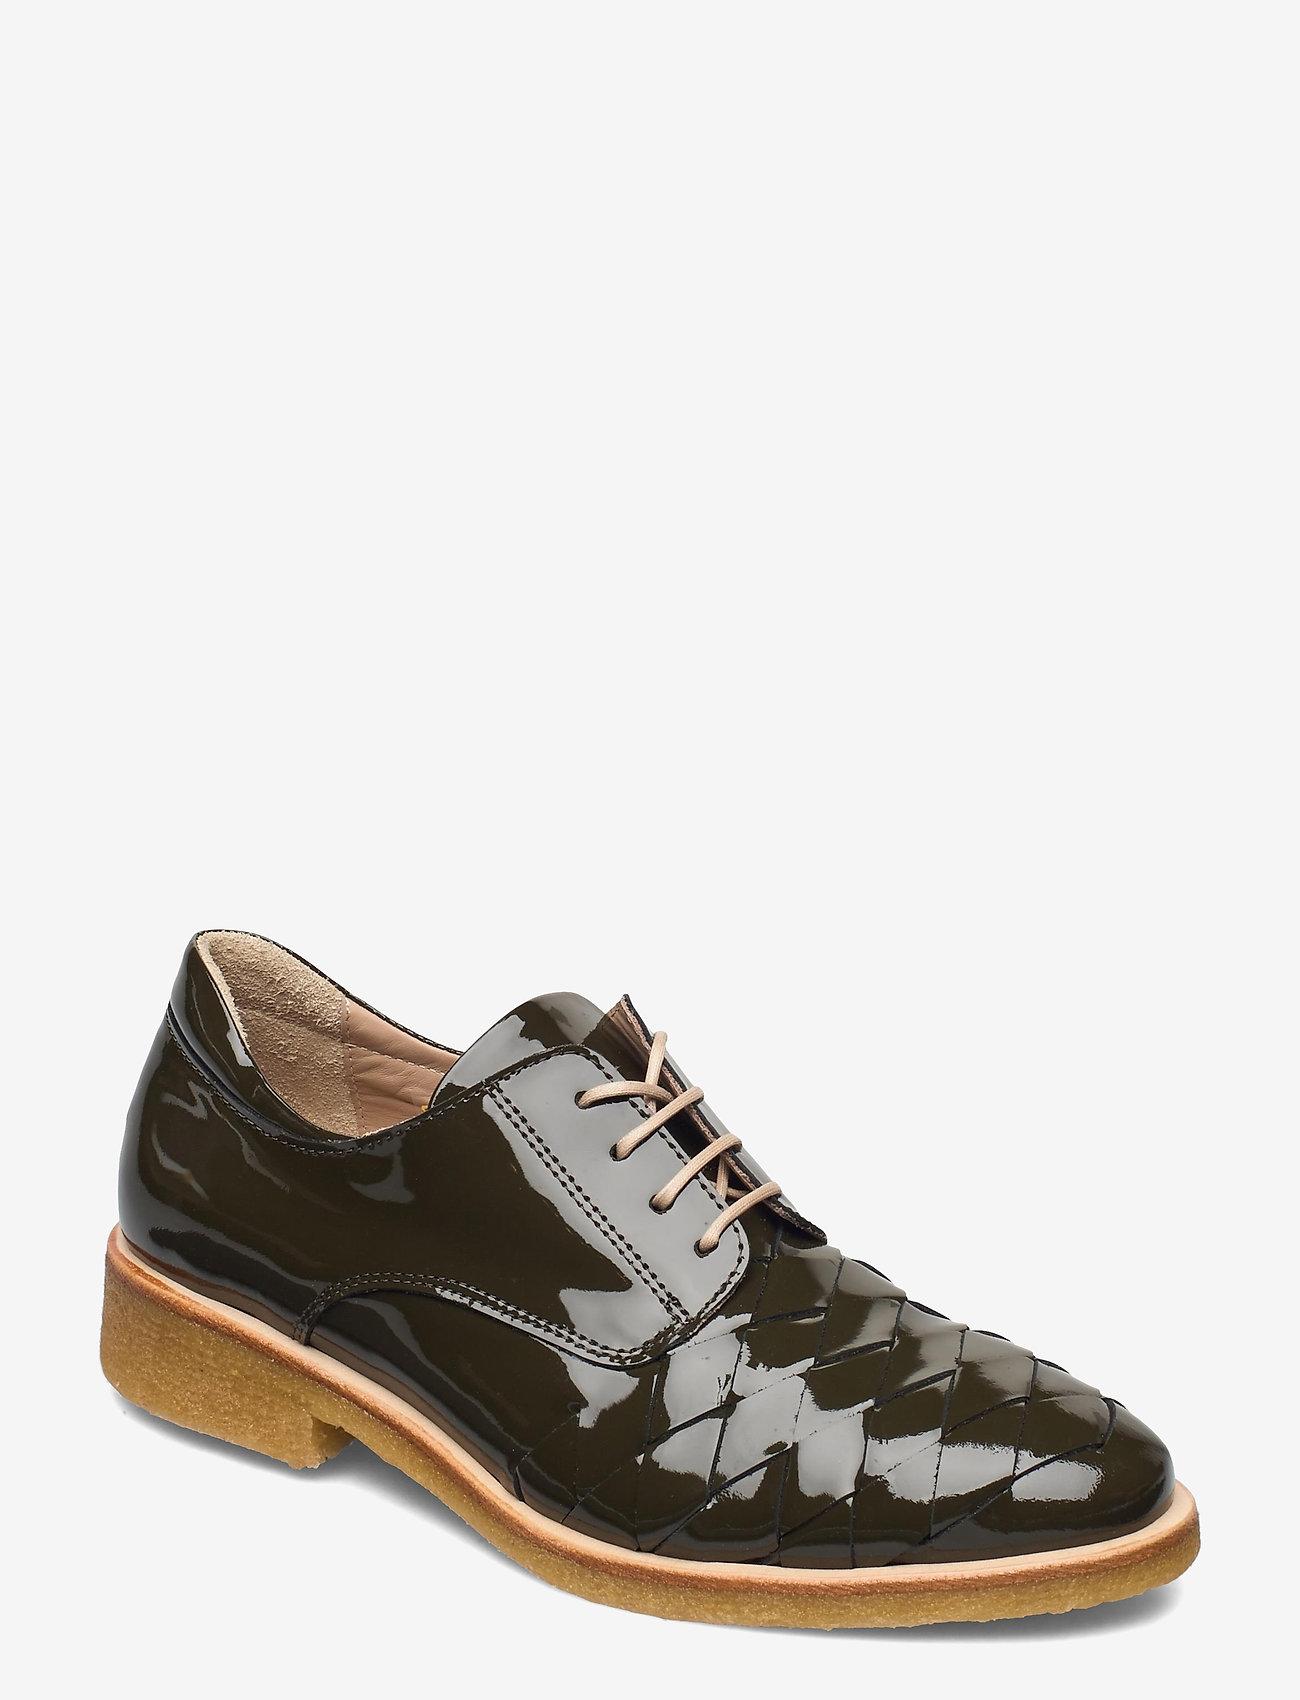 ANGULUS - Shoes - flat - snøresko - 2345 olive - 0